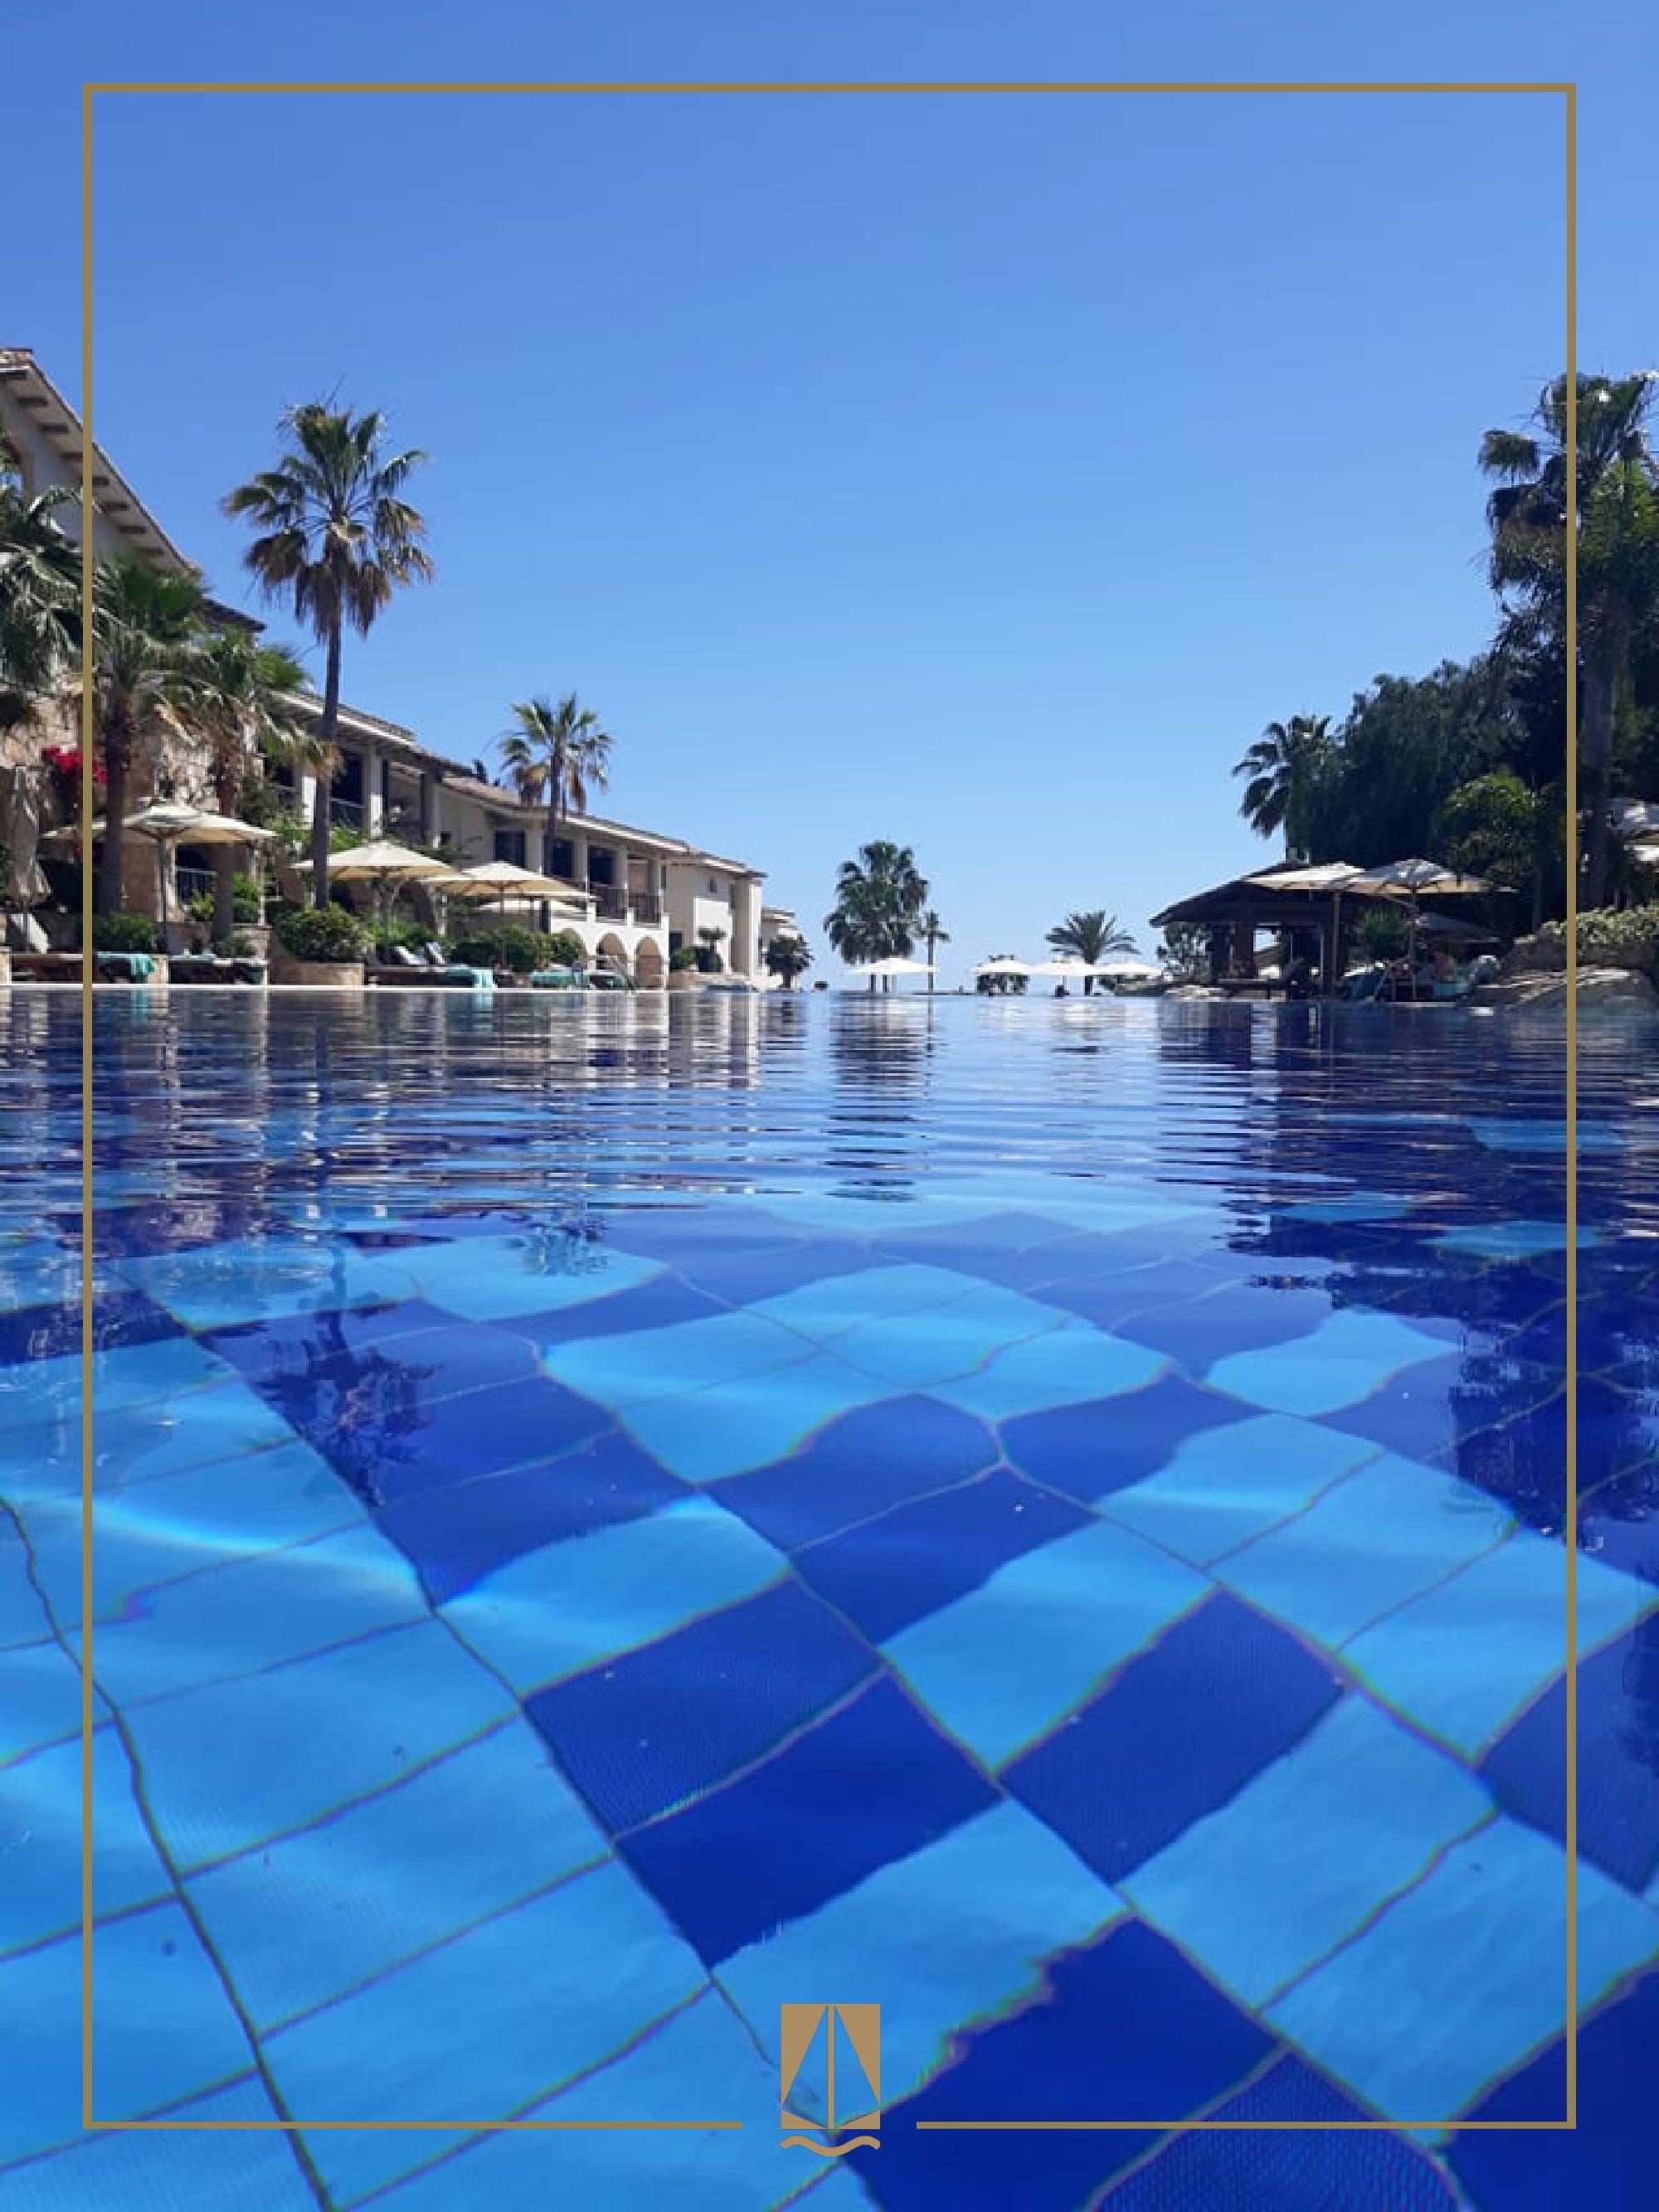 Tuesday Pool Day Pool Resort Beach Resorts